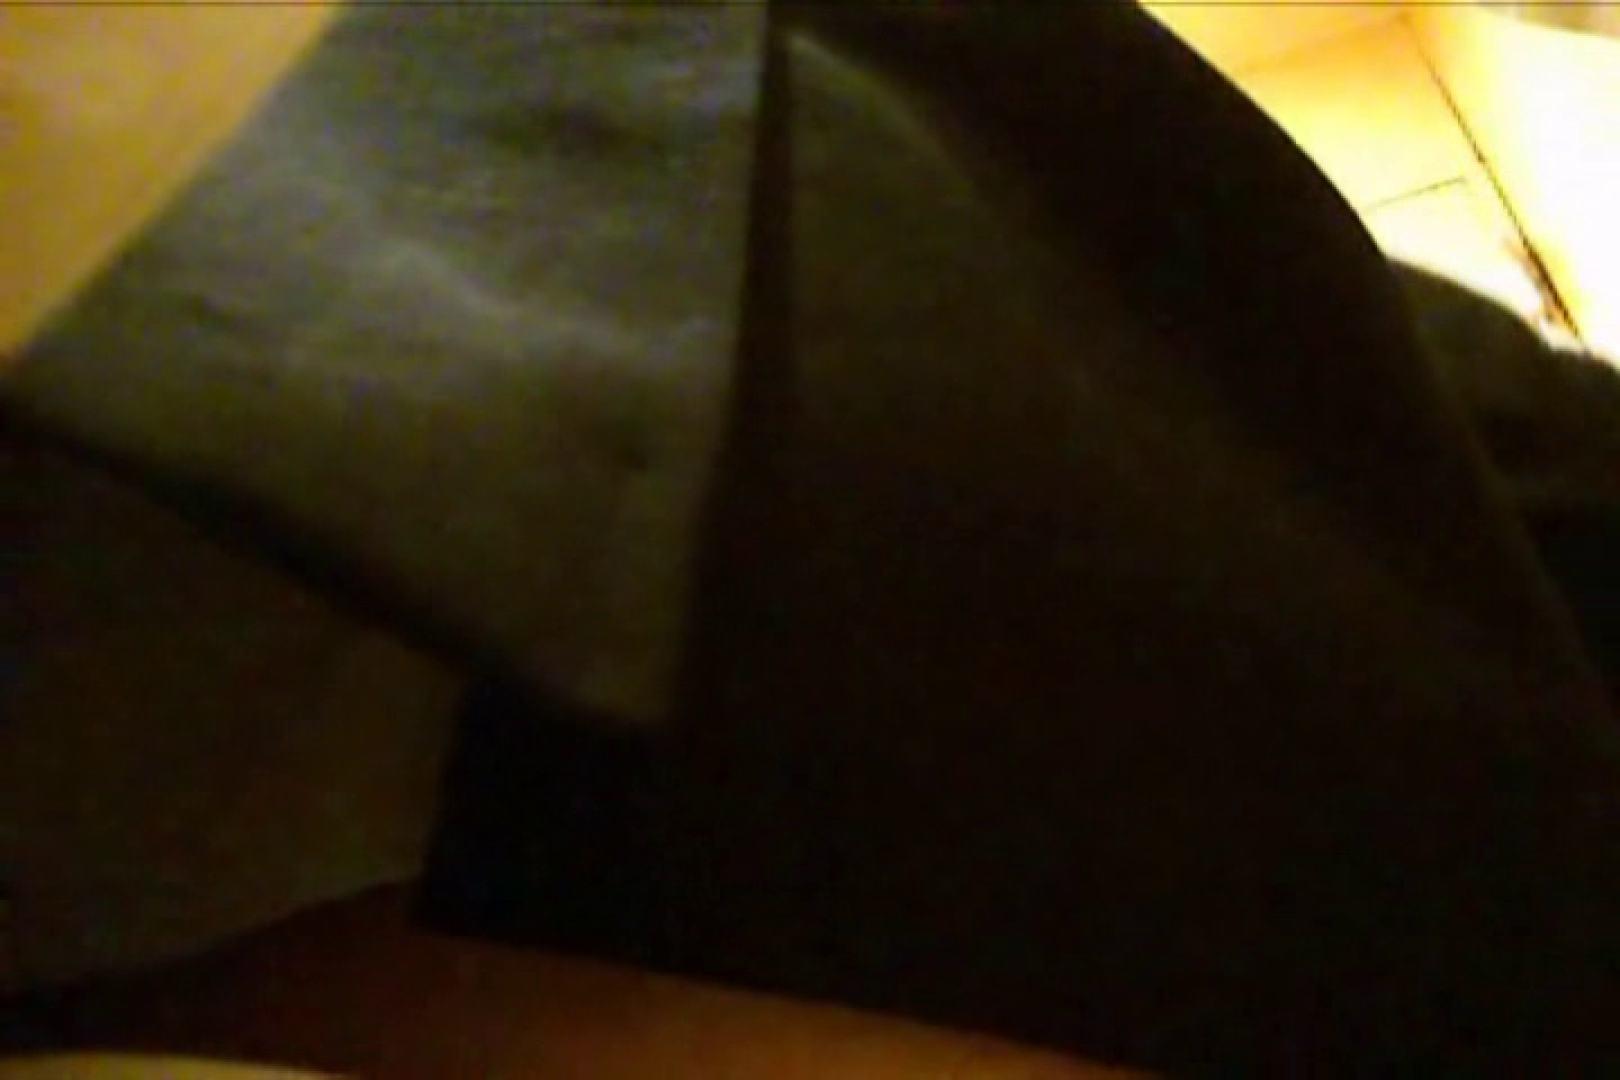 SEASON 2ND!掴み取りさんの洗面所覗き!in新幹線!VOL.01 ボーイズ覗き | リーマン系ボーイズ  106pic 56